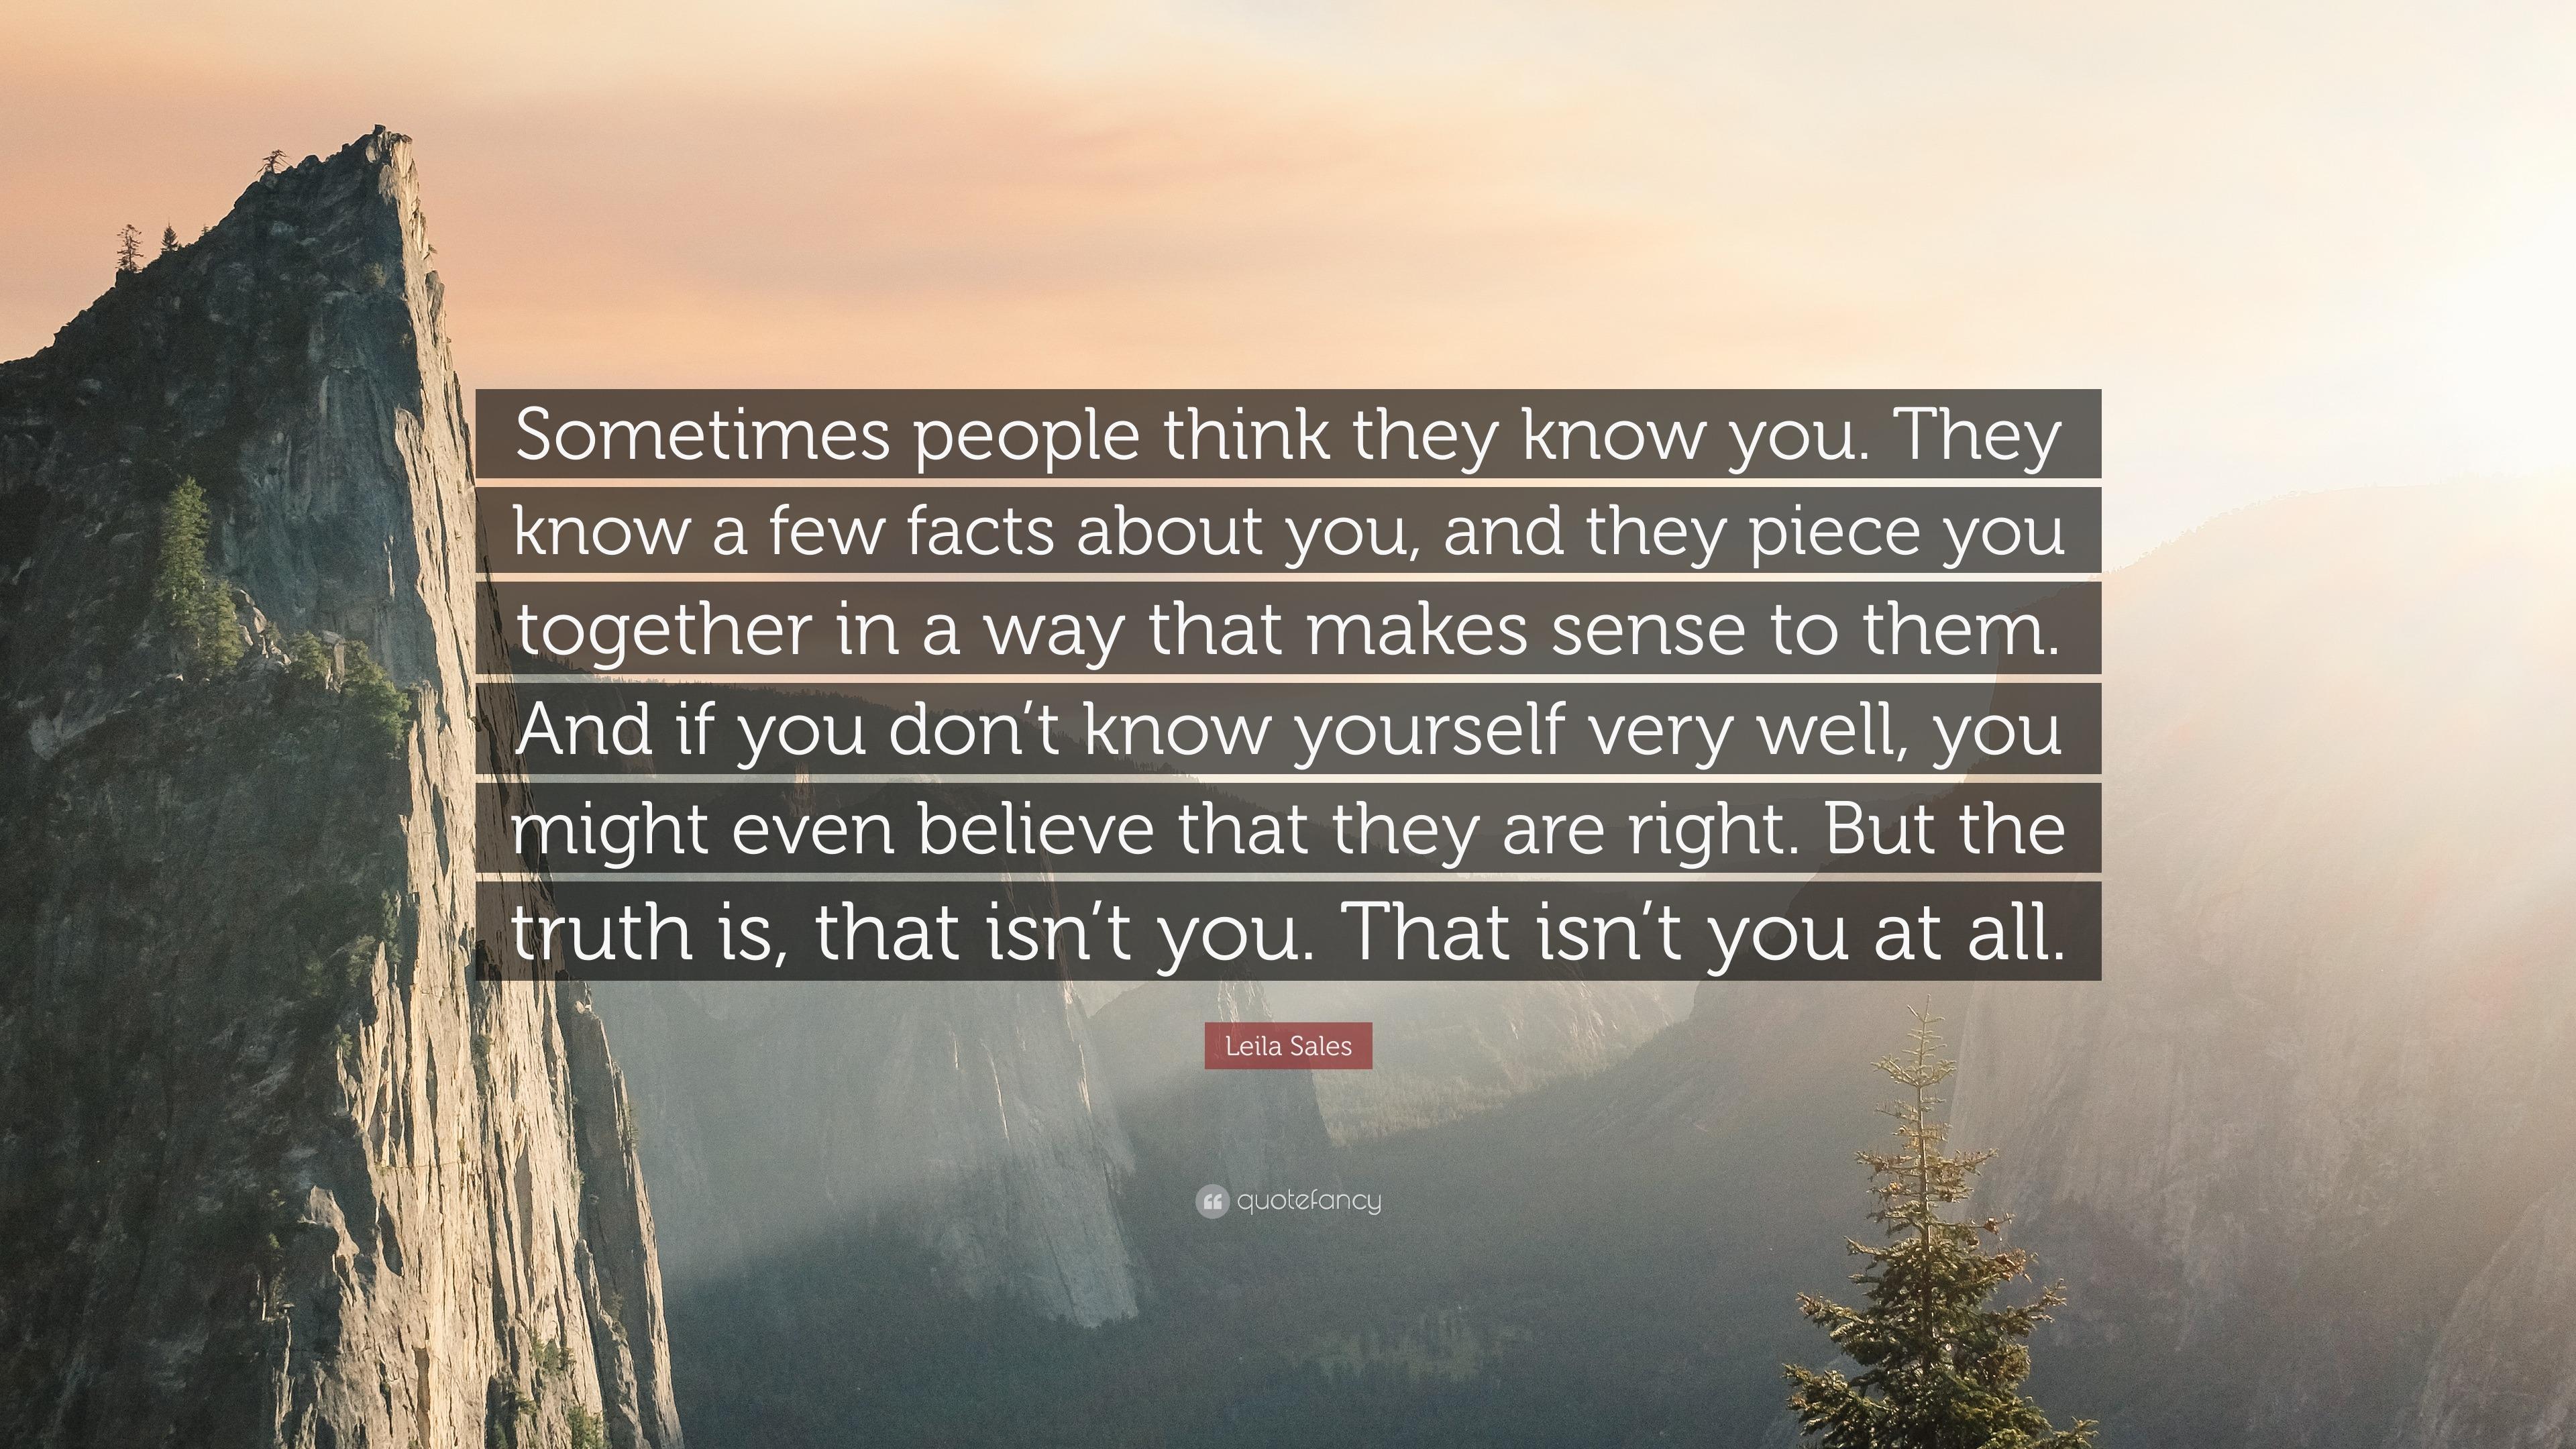 sales quote